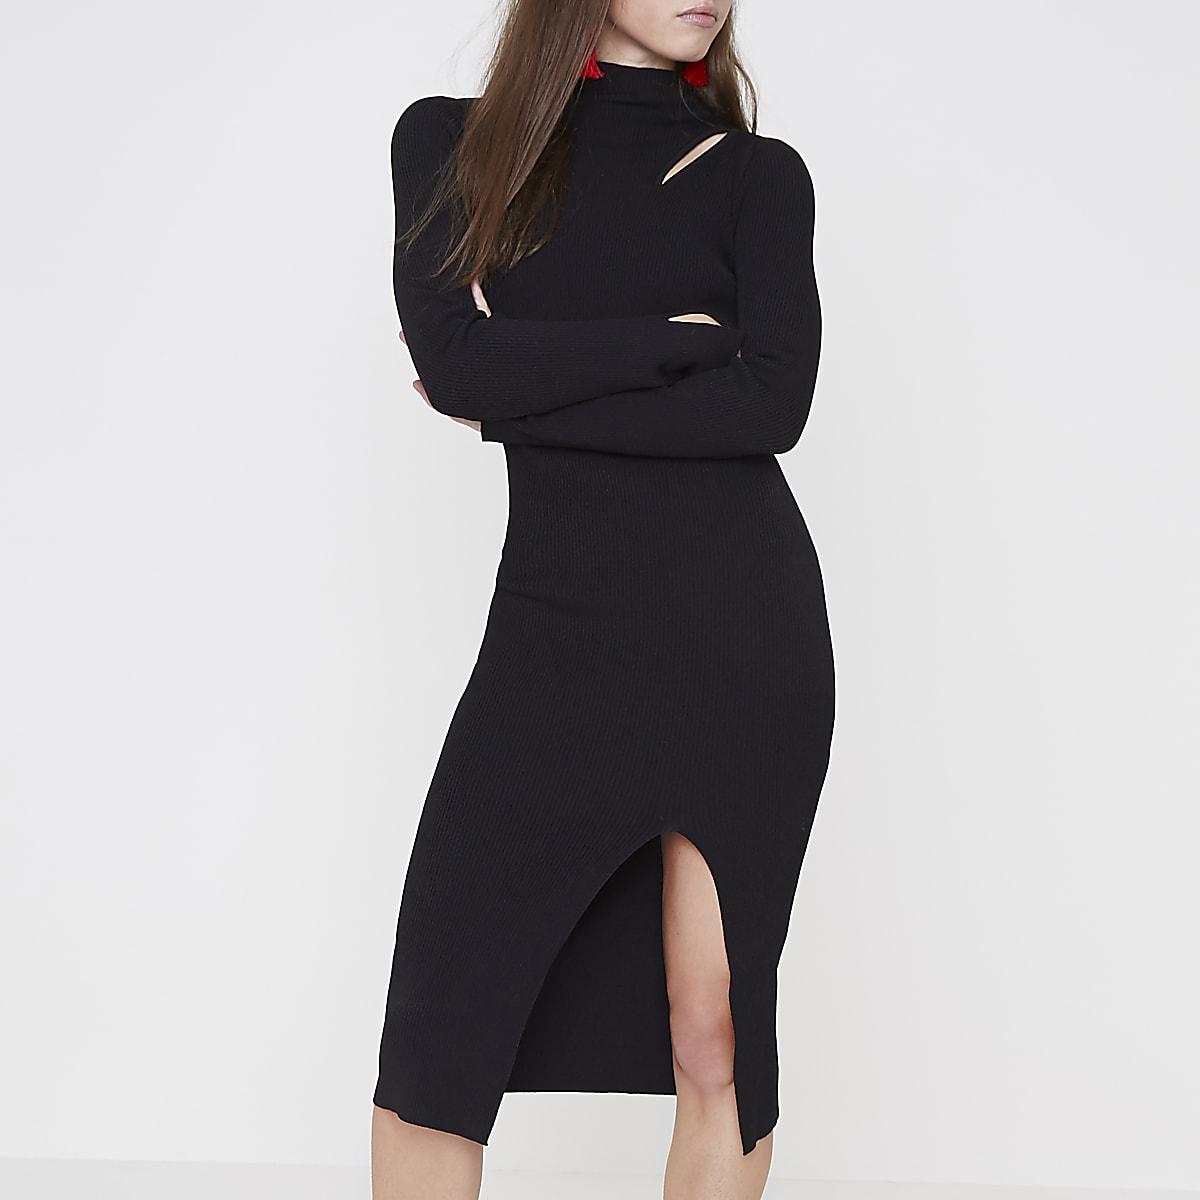 Petite black knit turtle neck bodycon dress